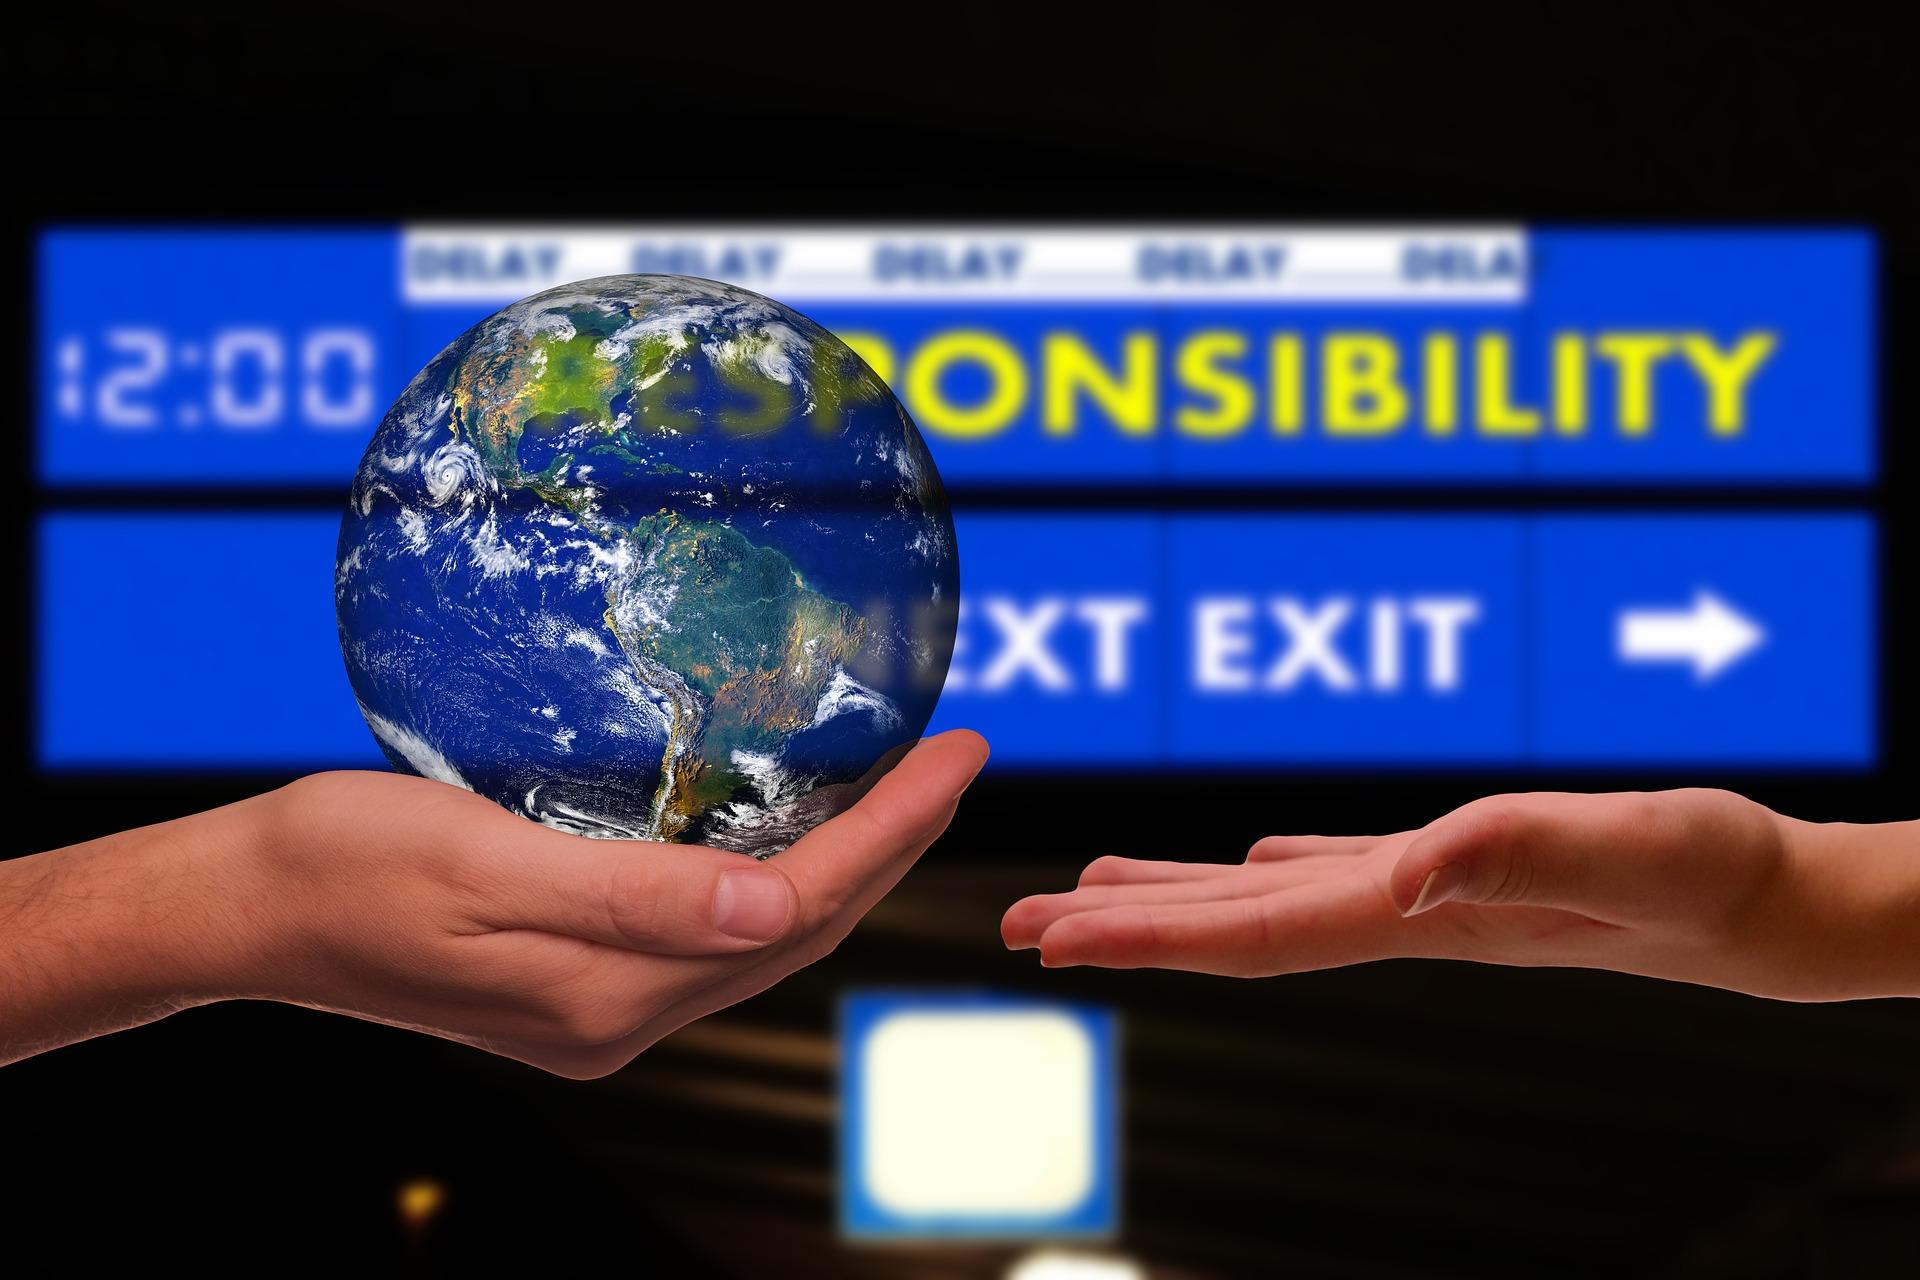 Responsibility - next Exit